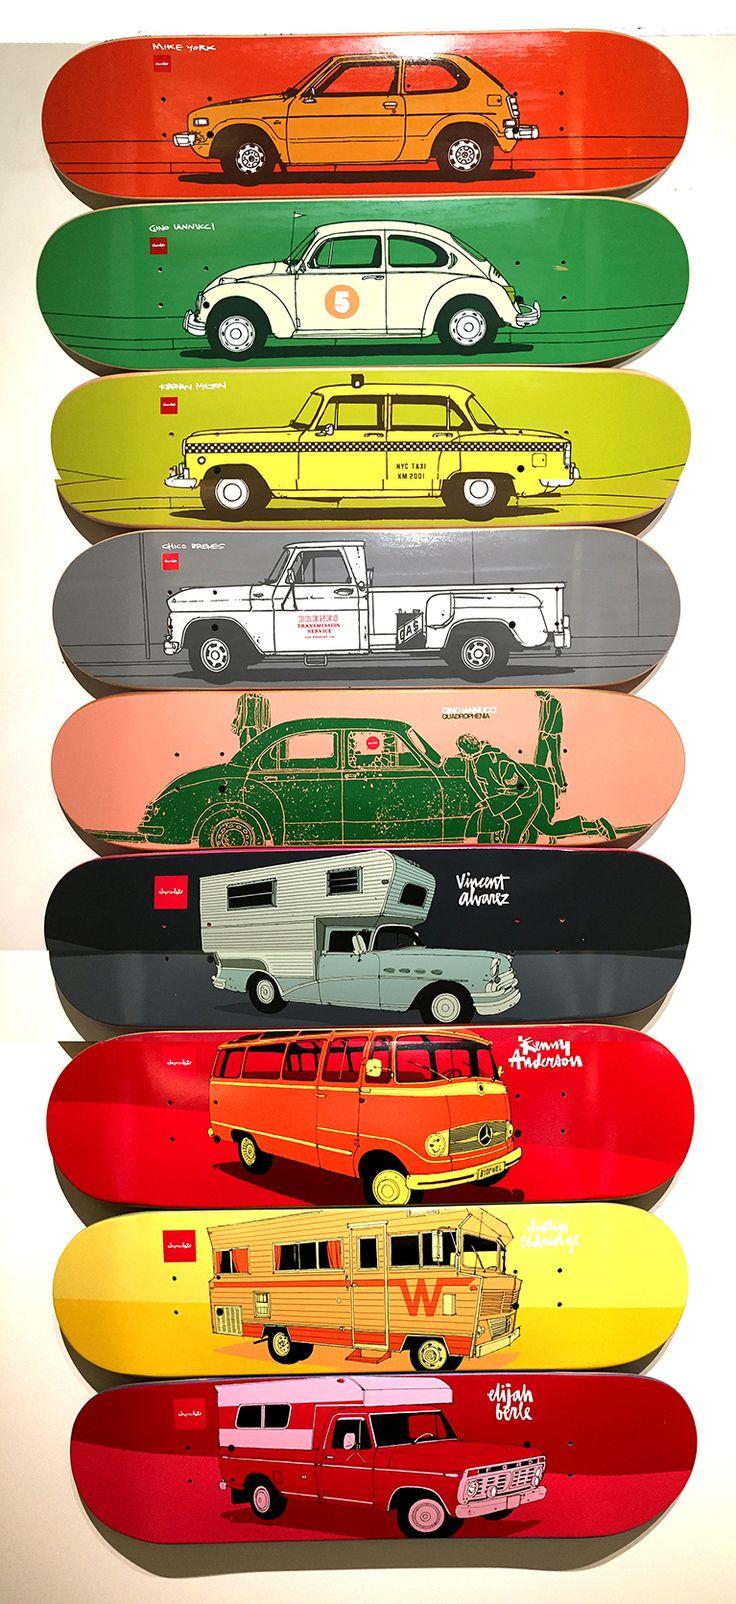 Chocolate Skateboards Car Decks #evanhecox